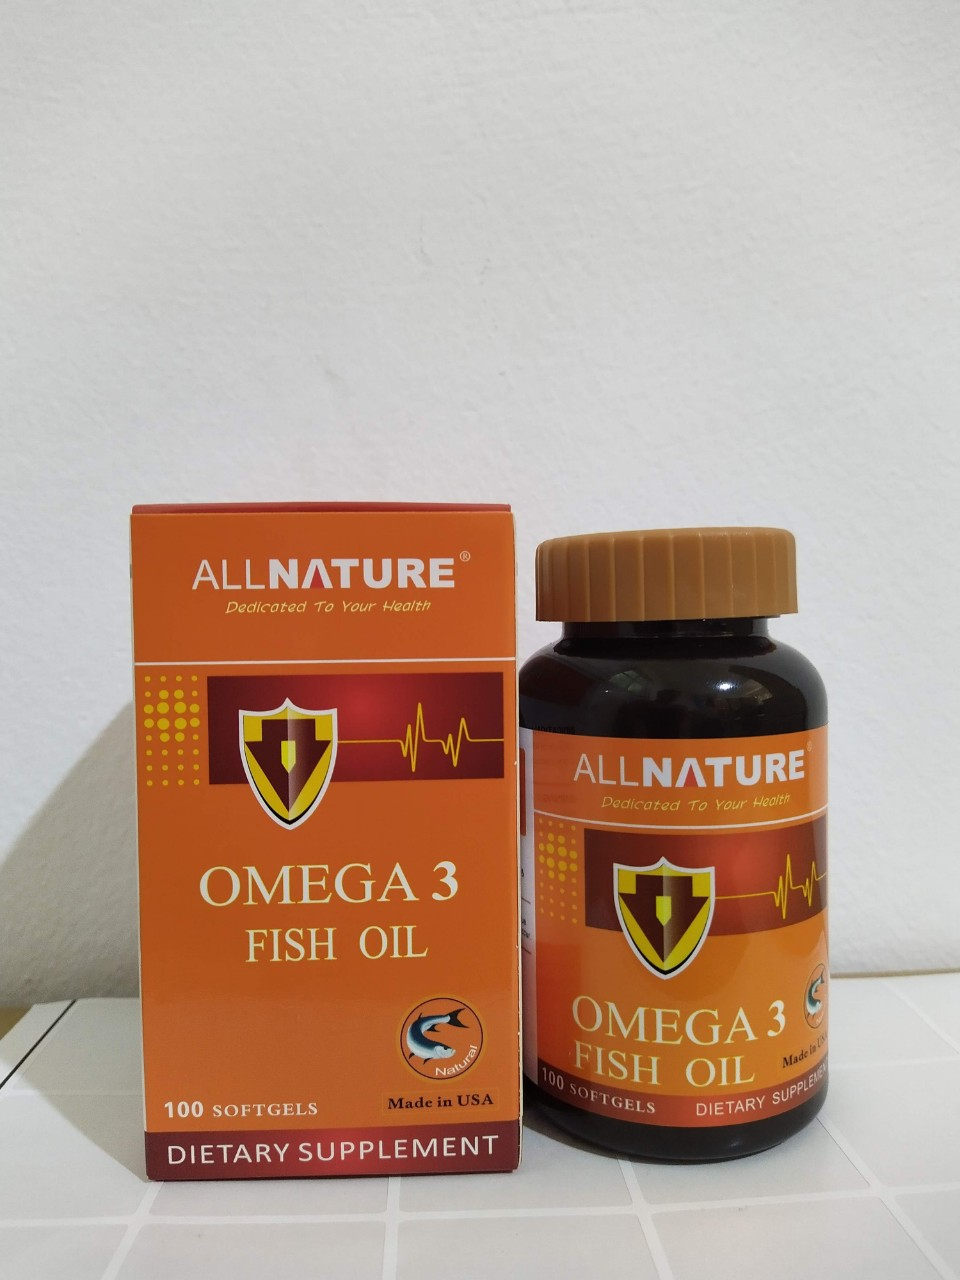 Super Omega 3 fish oil